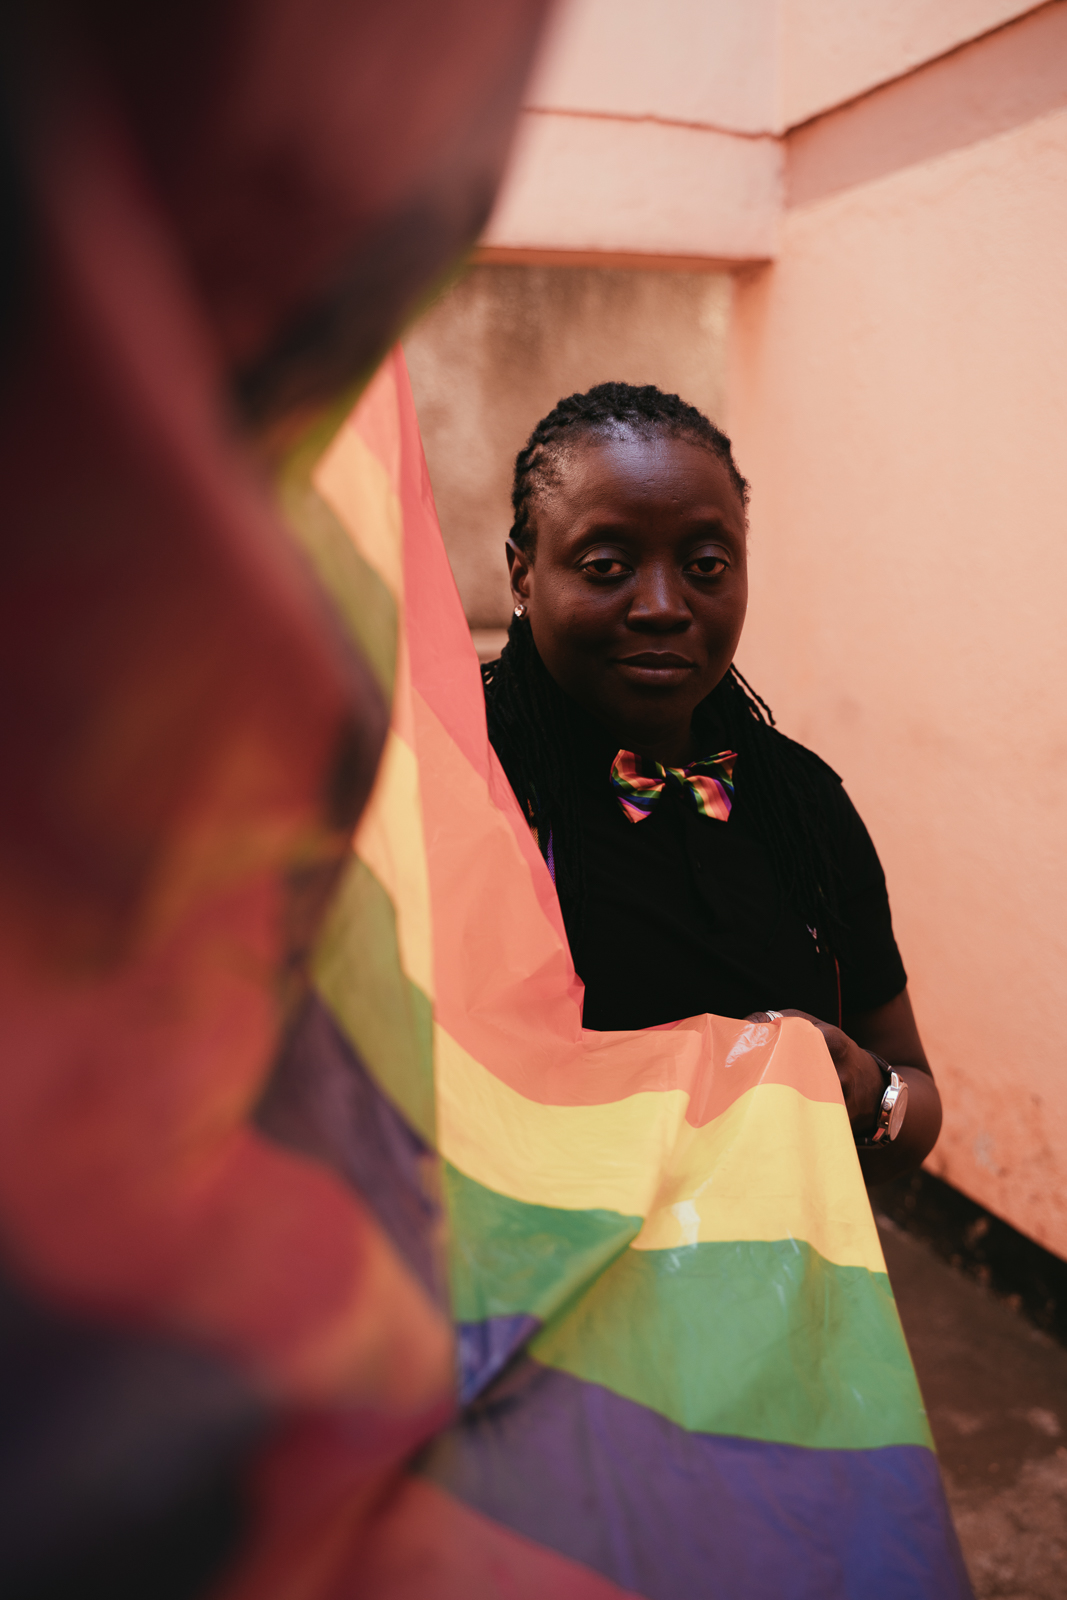 Queer_RebeccaRuetten_Uganda_Biggie_web-08848.jpg